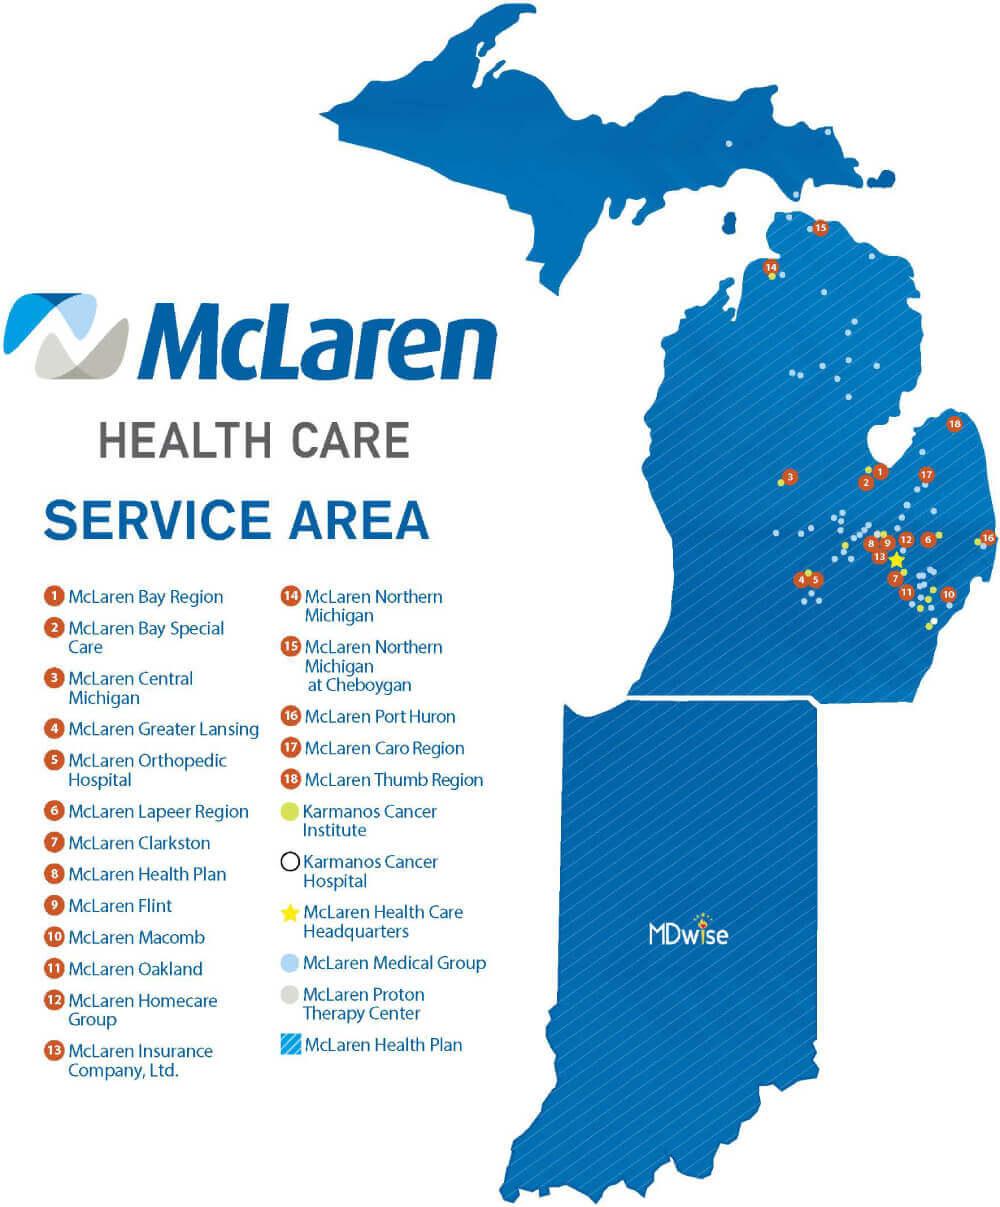 About McLaren Health Care